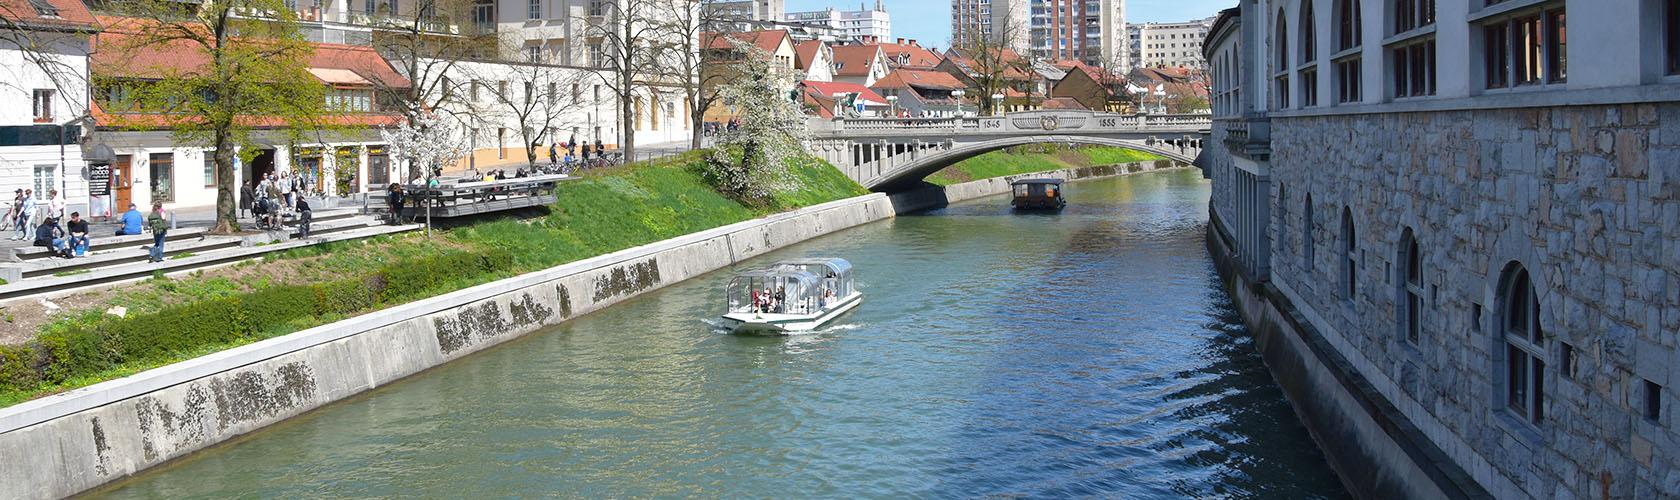 Ljubljanica rivier